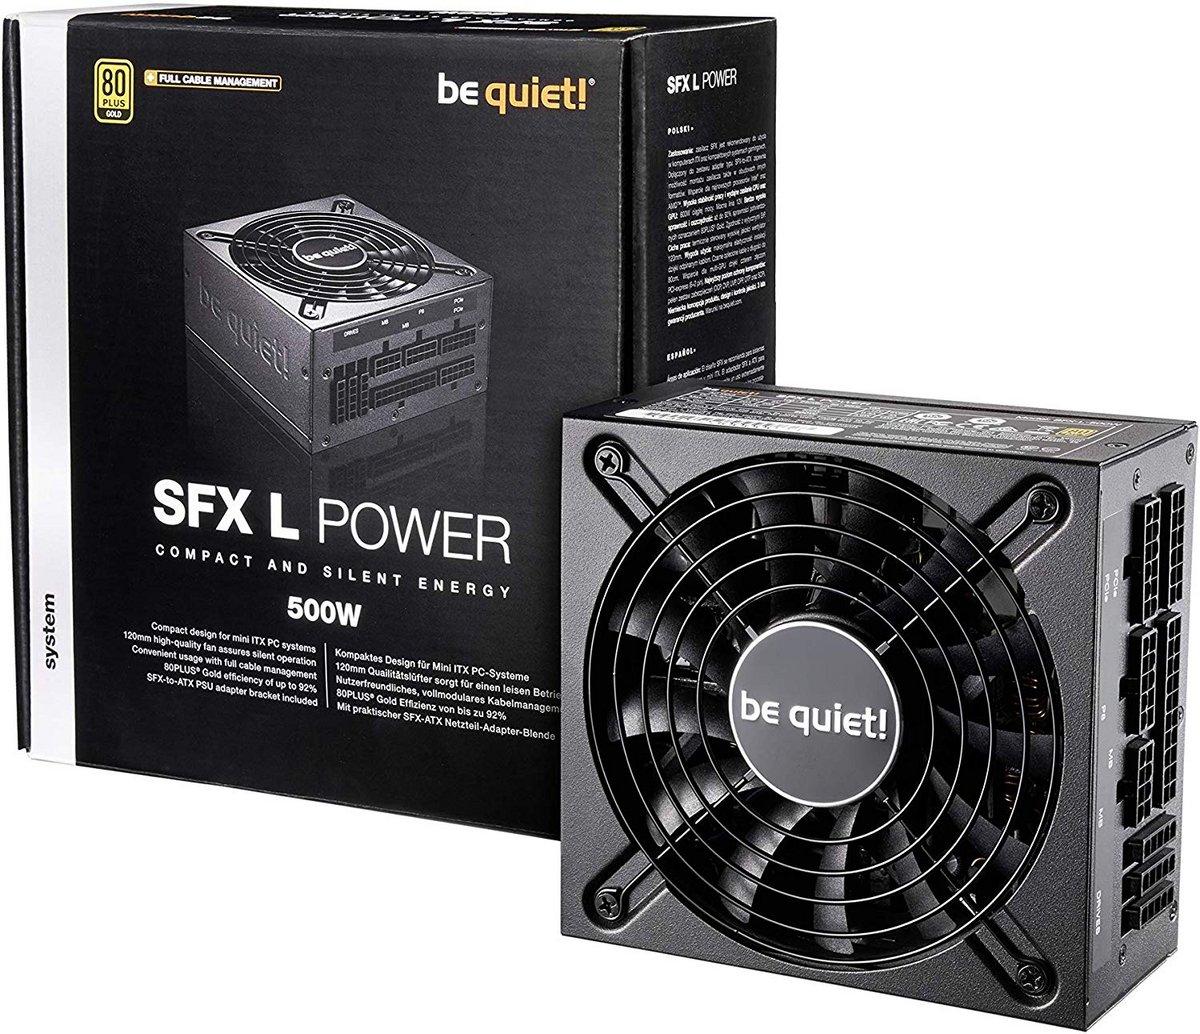 Be quiet! SFX-L 500W